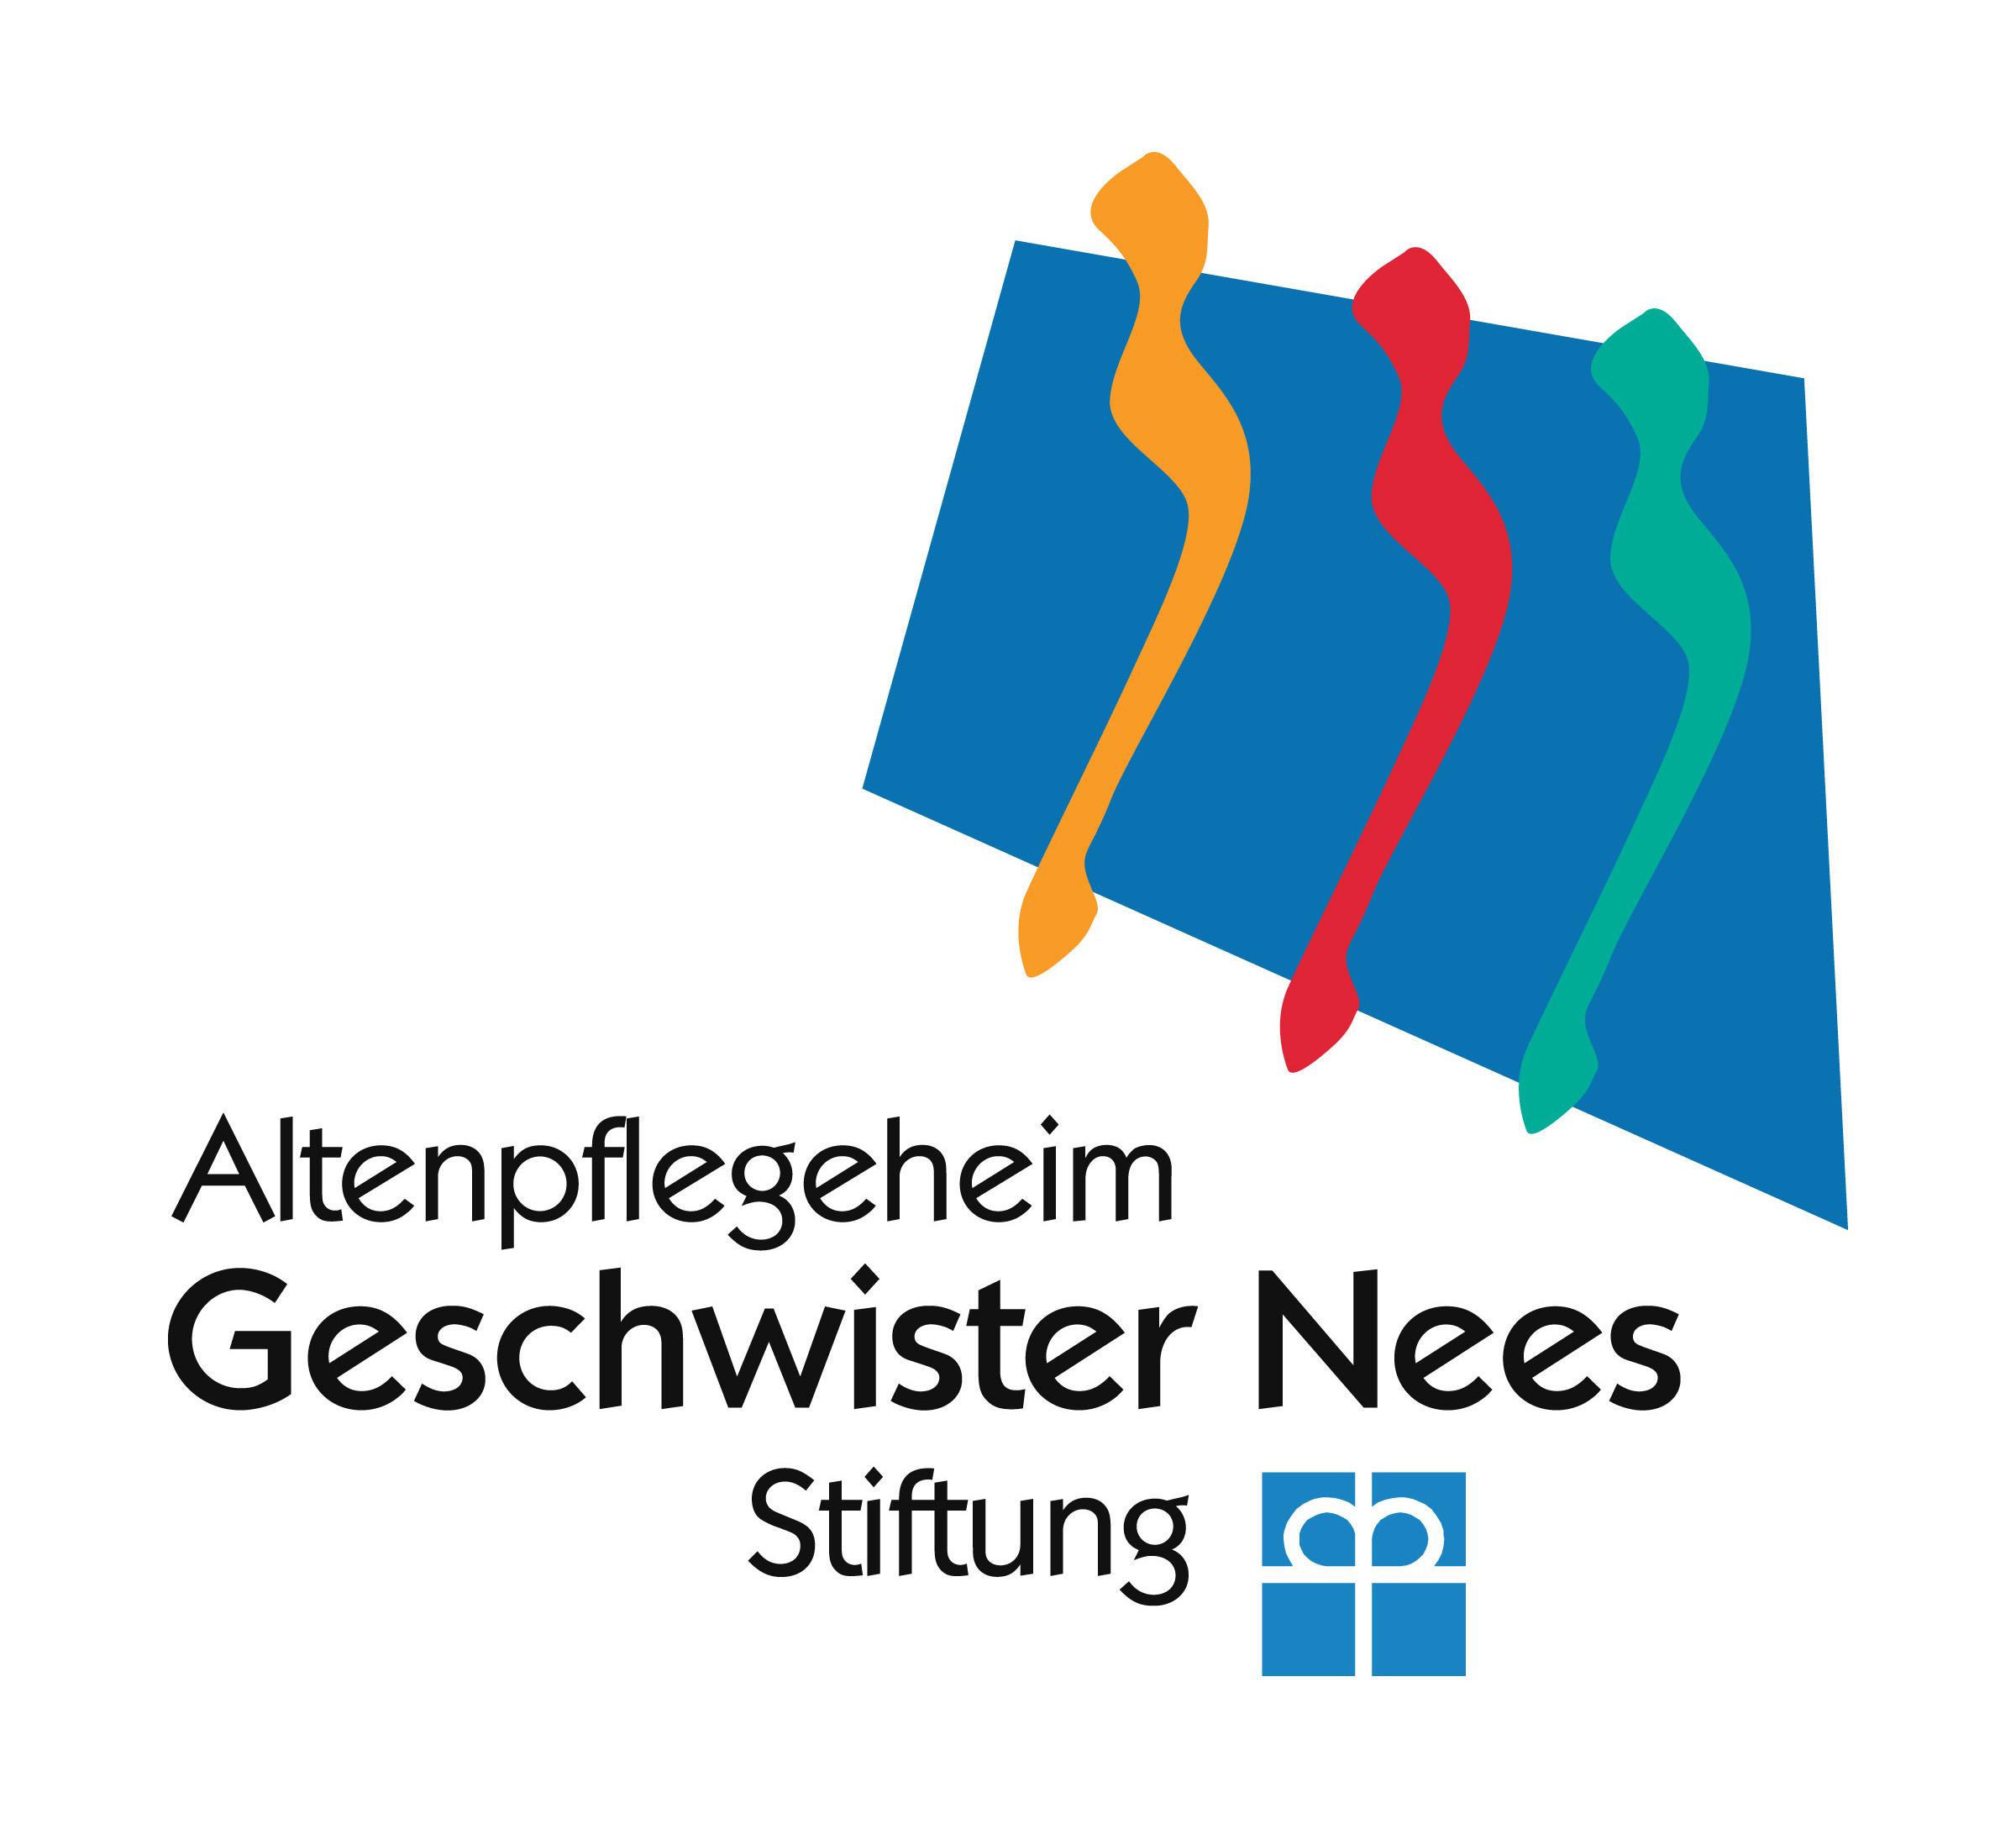 Seniorenheim - Geschwister Nees